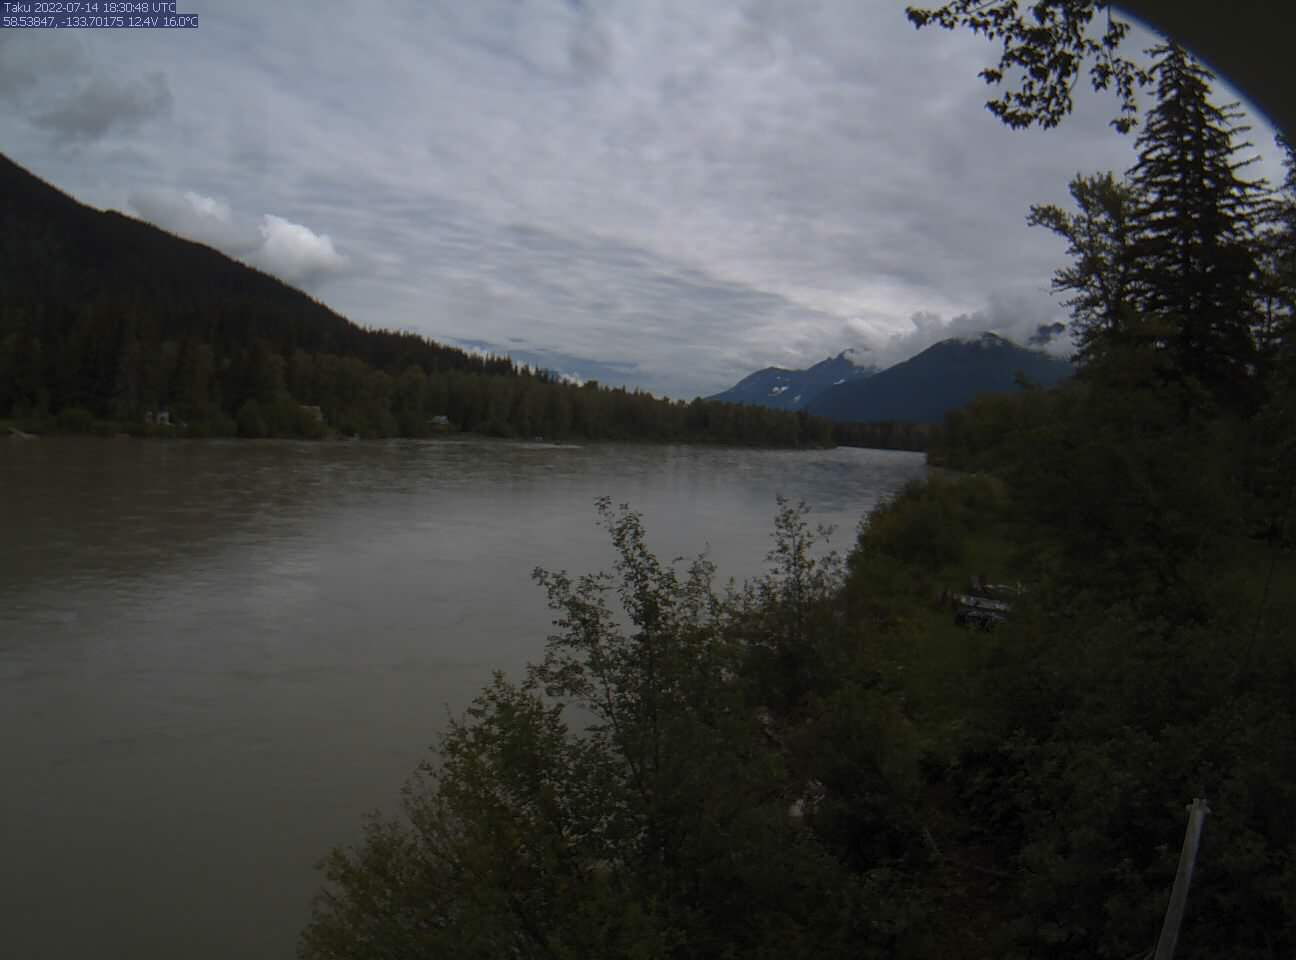 Taku River Image